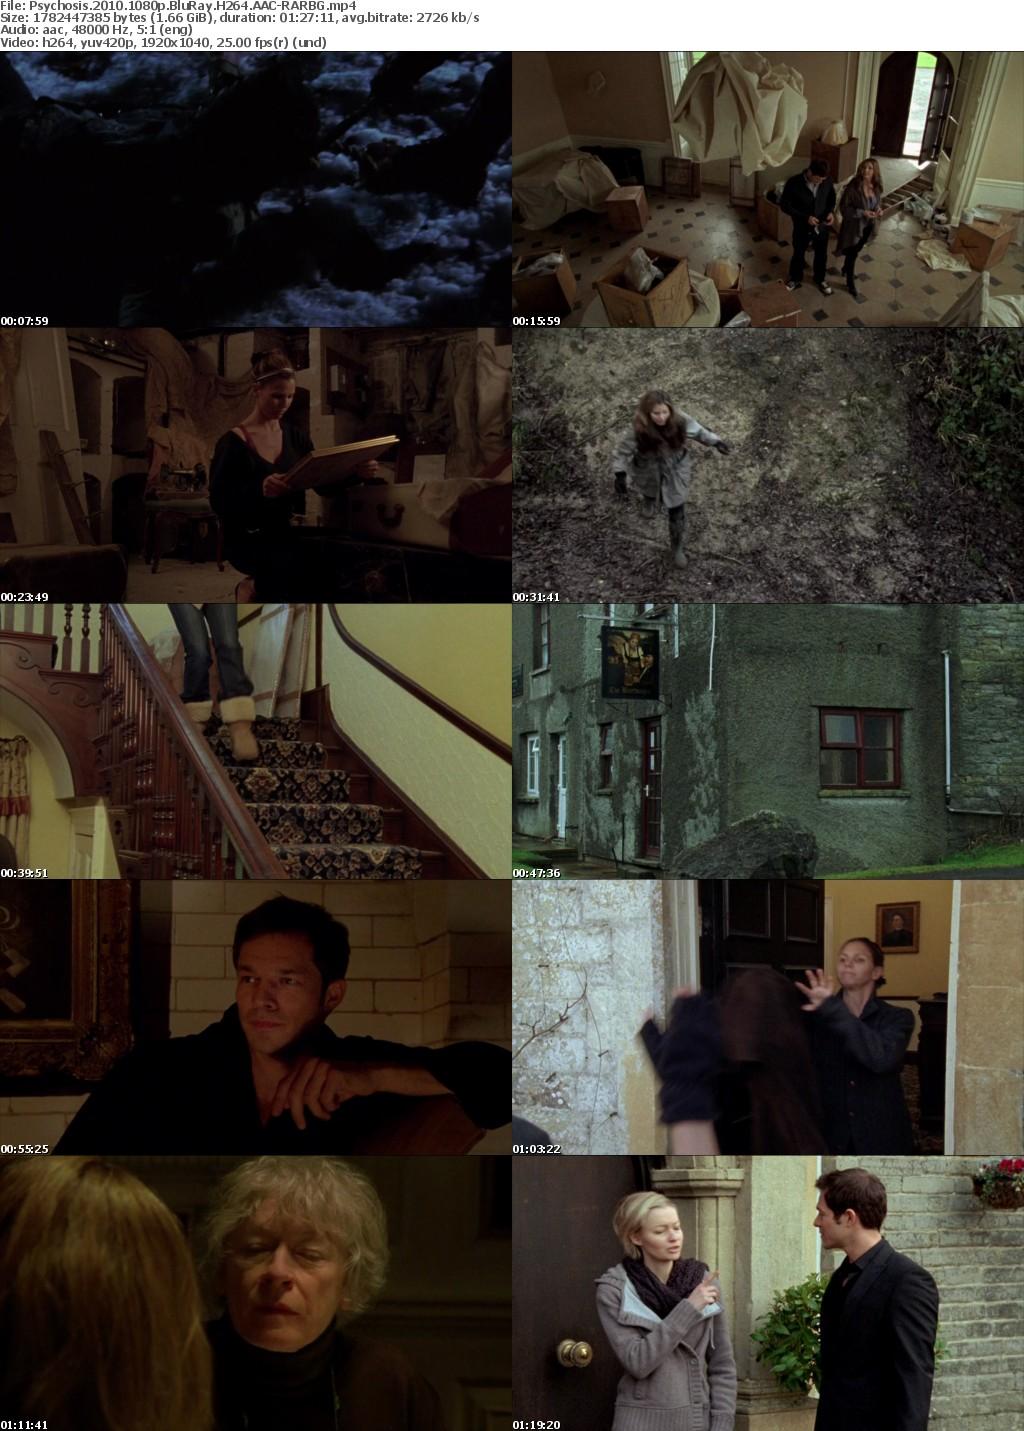 Psychosis (2010) 1080p BluRay H264 AAC-RARBG